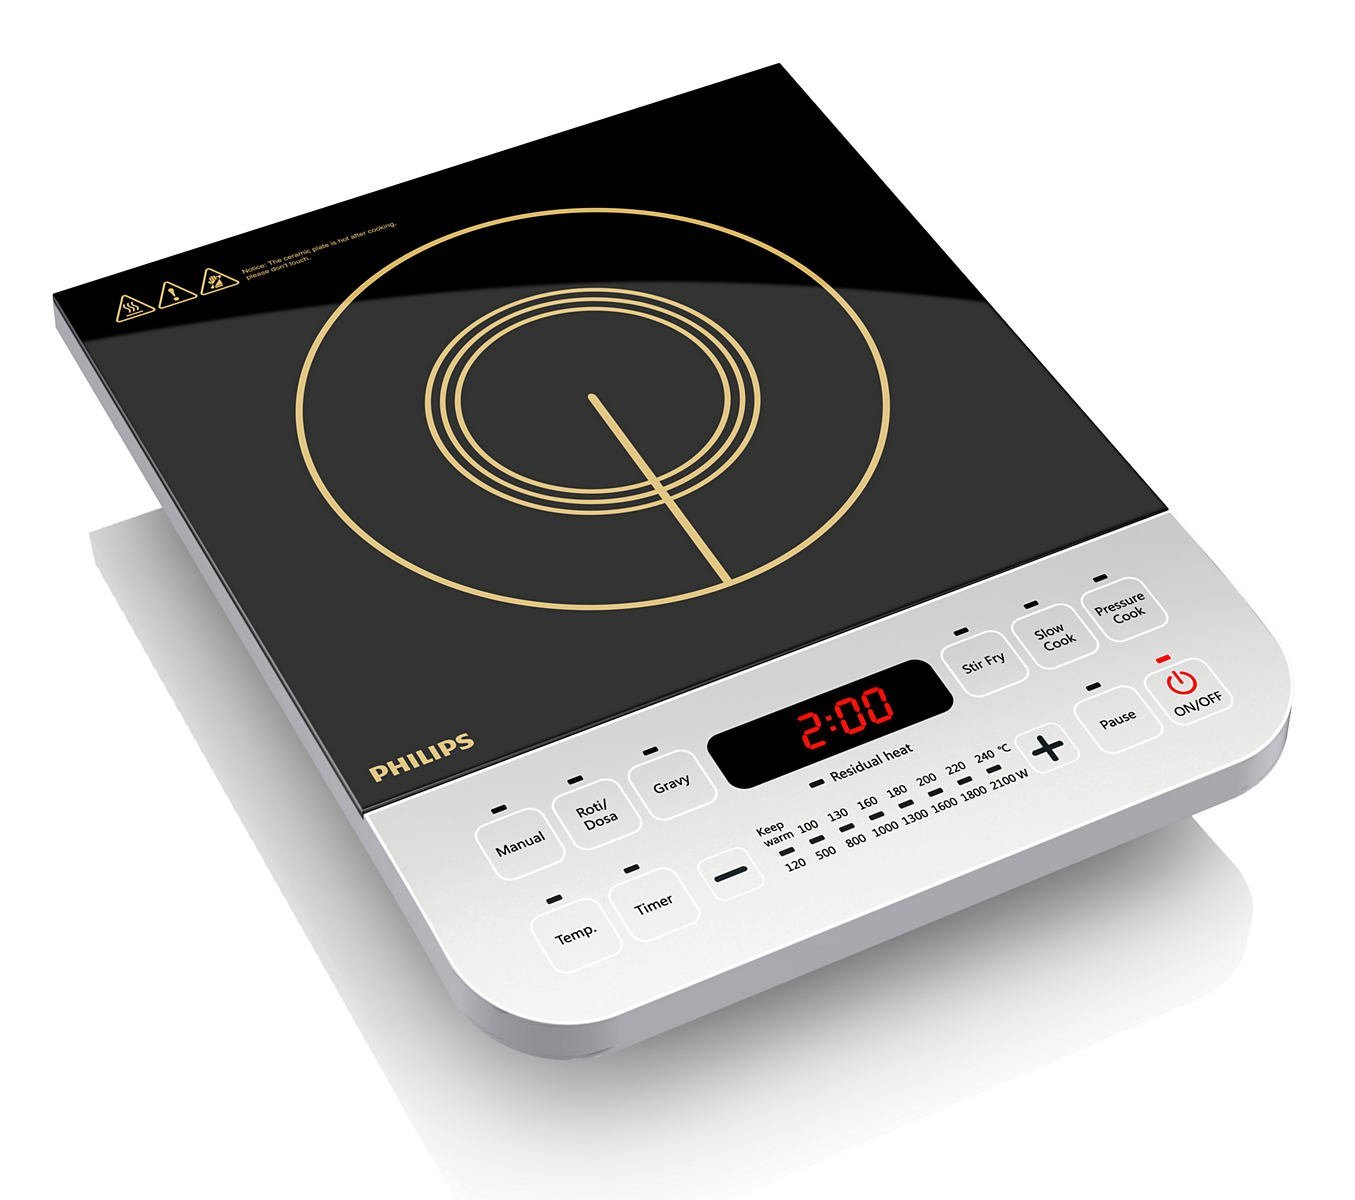 philips viva collection hd4928 2100 watt induction cooktop black rh bestforyourhome co in philips induction cooker specifications philips induction stove manual